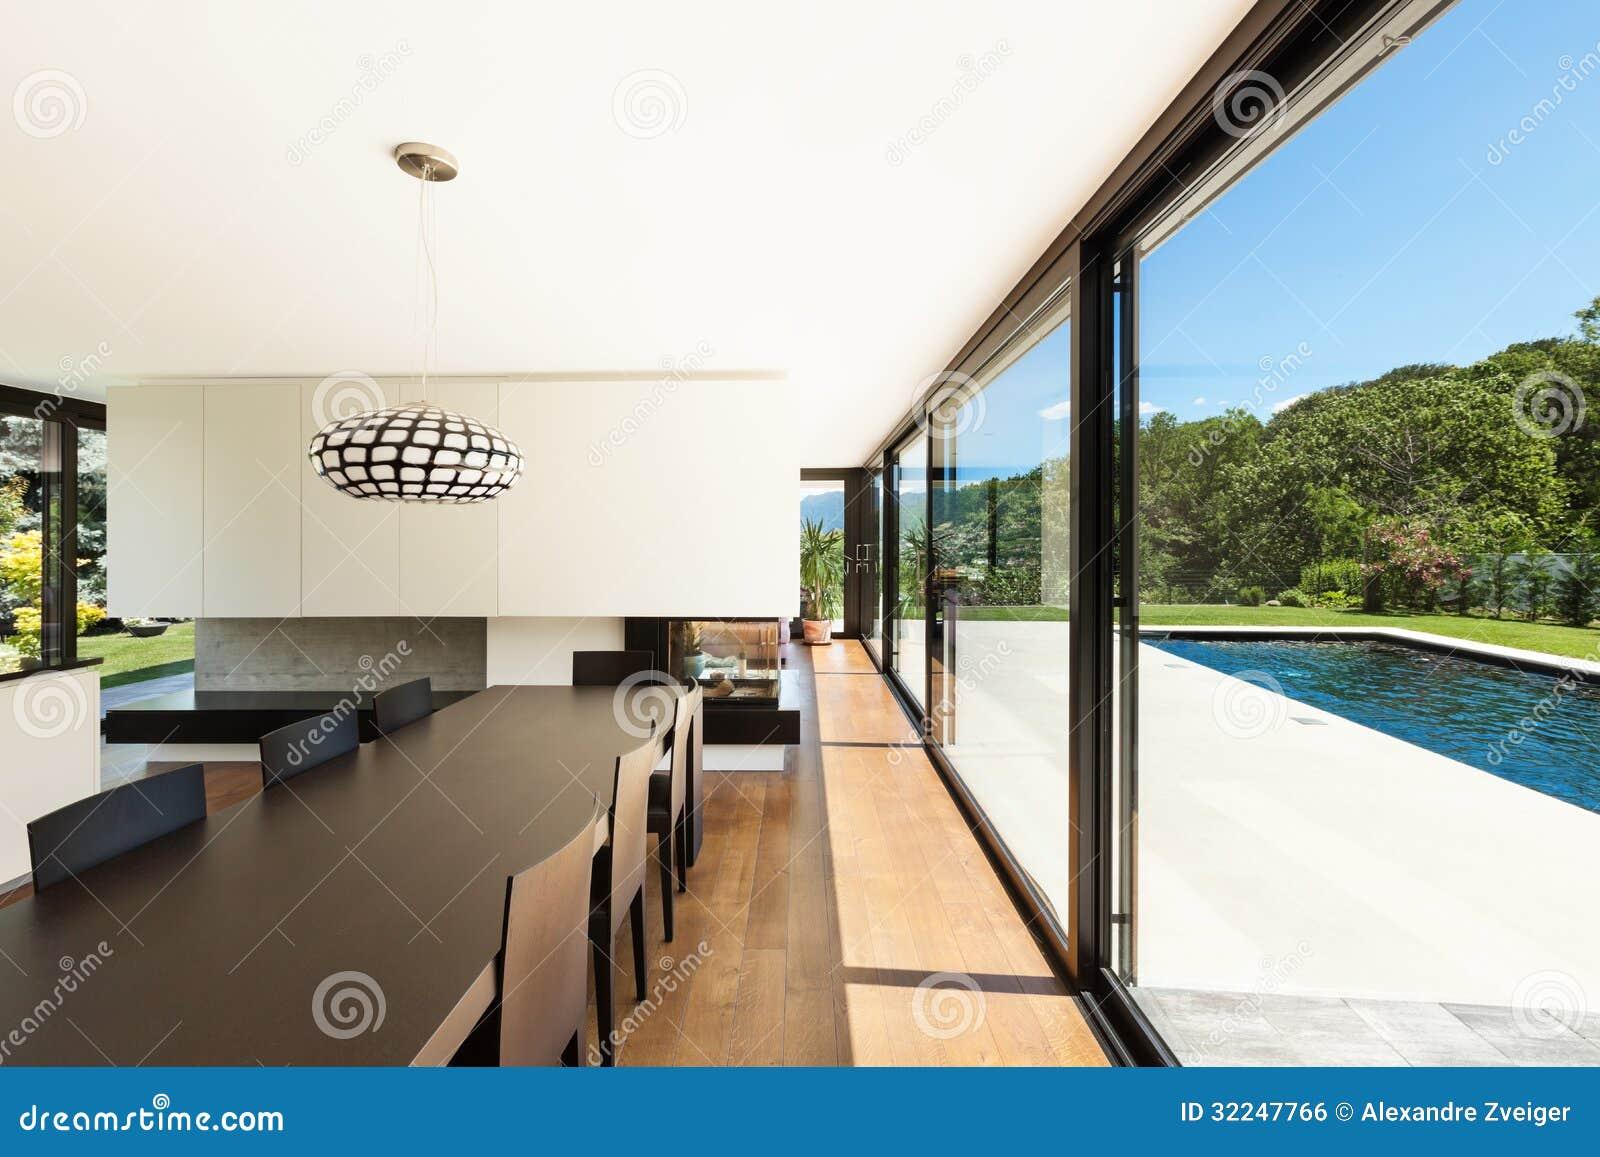 Modern villa interior stock photo. image of black garden 32247766